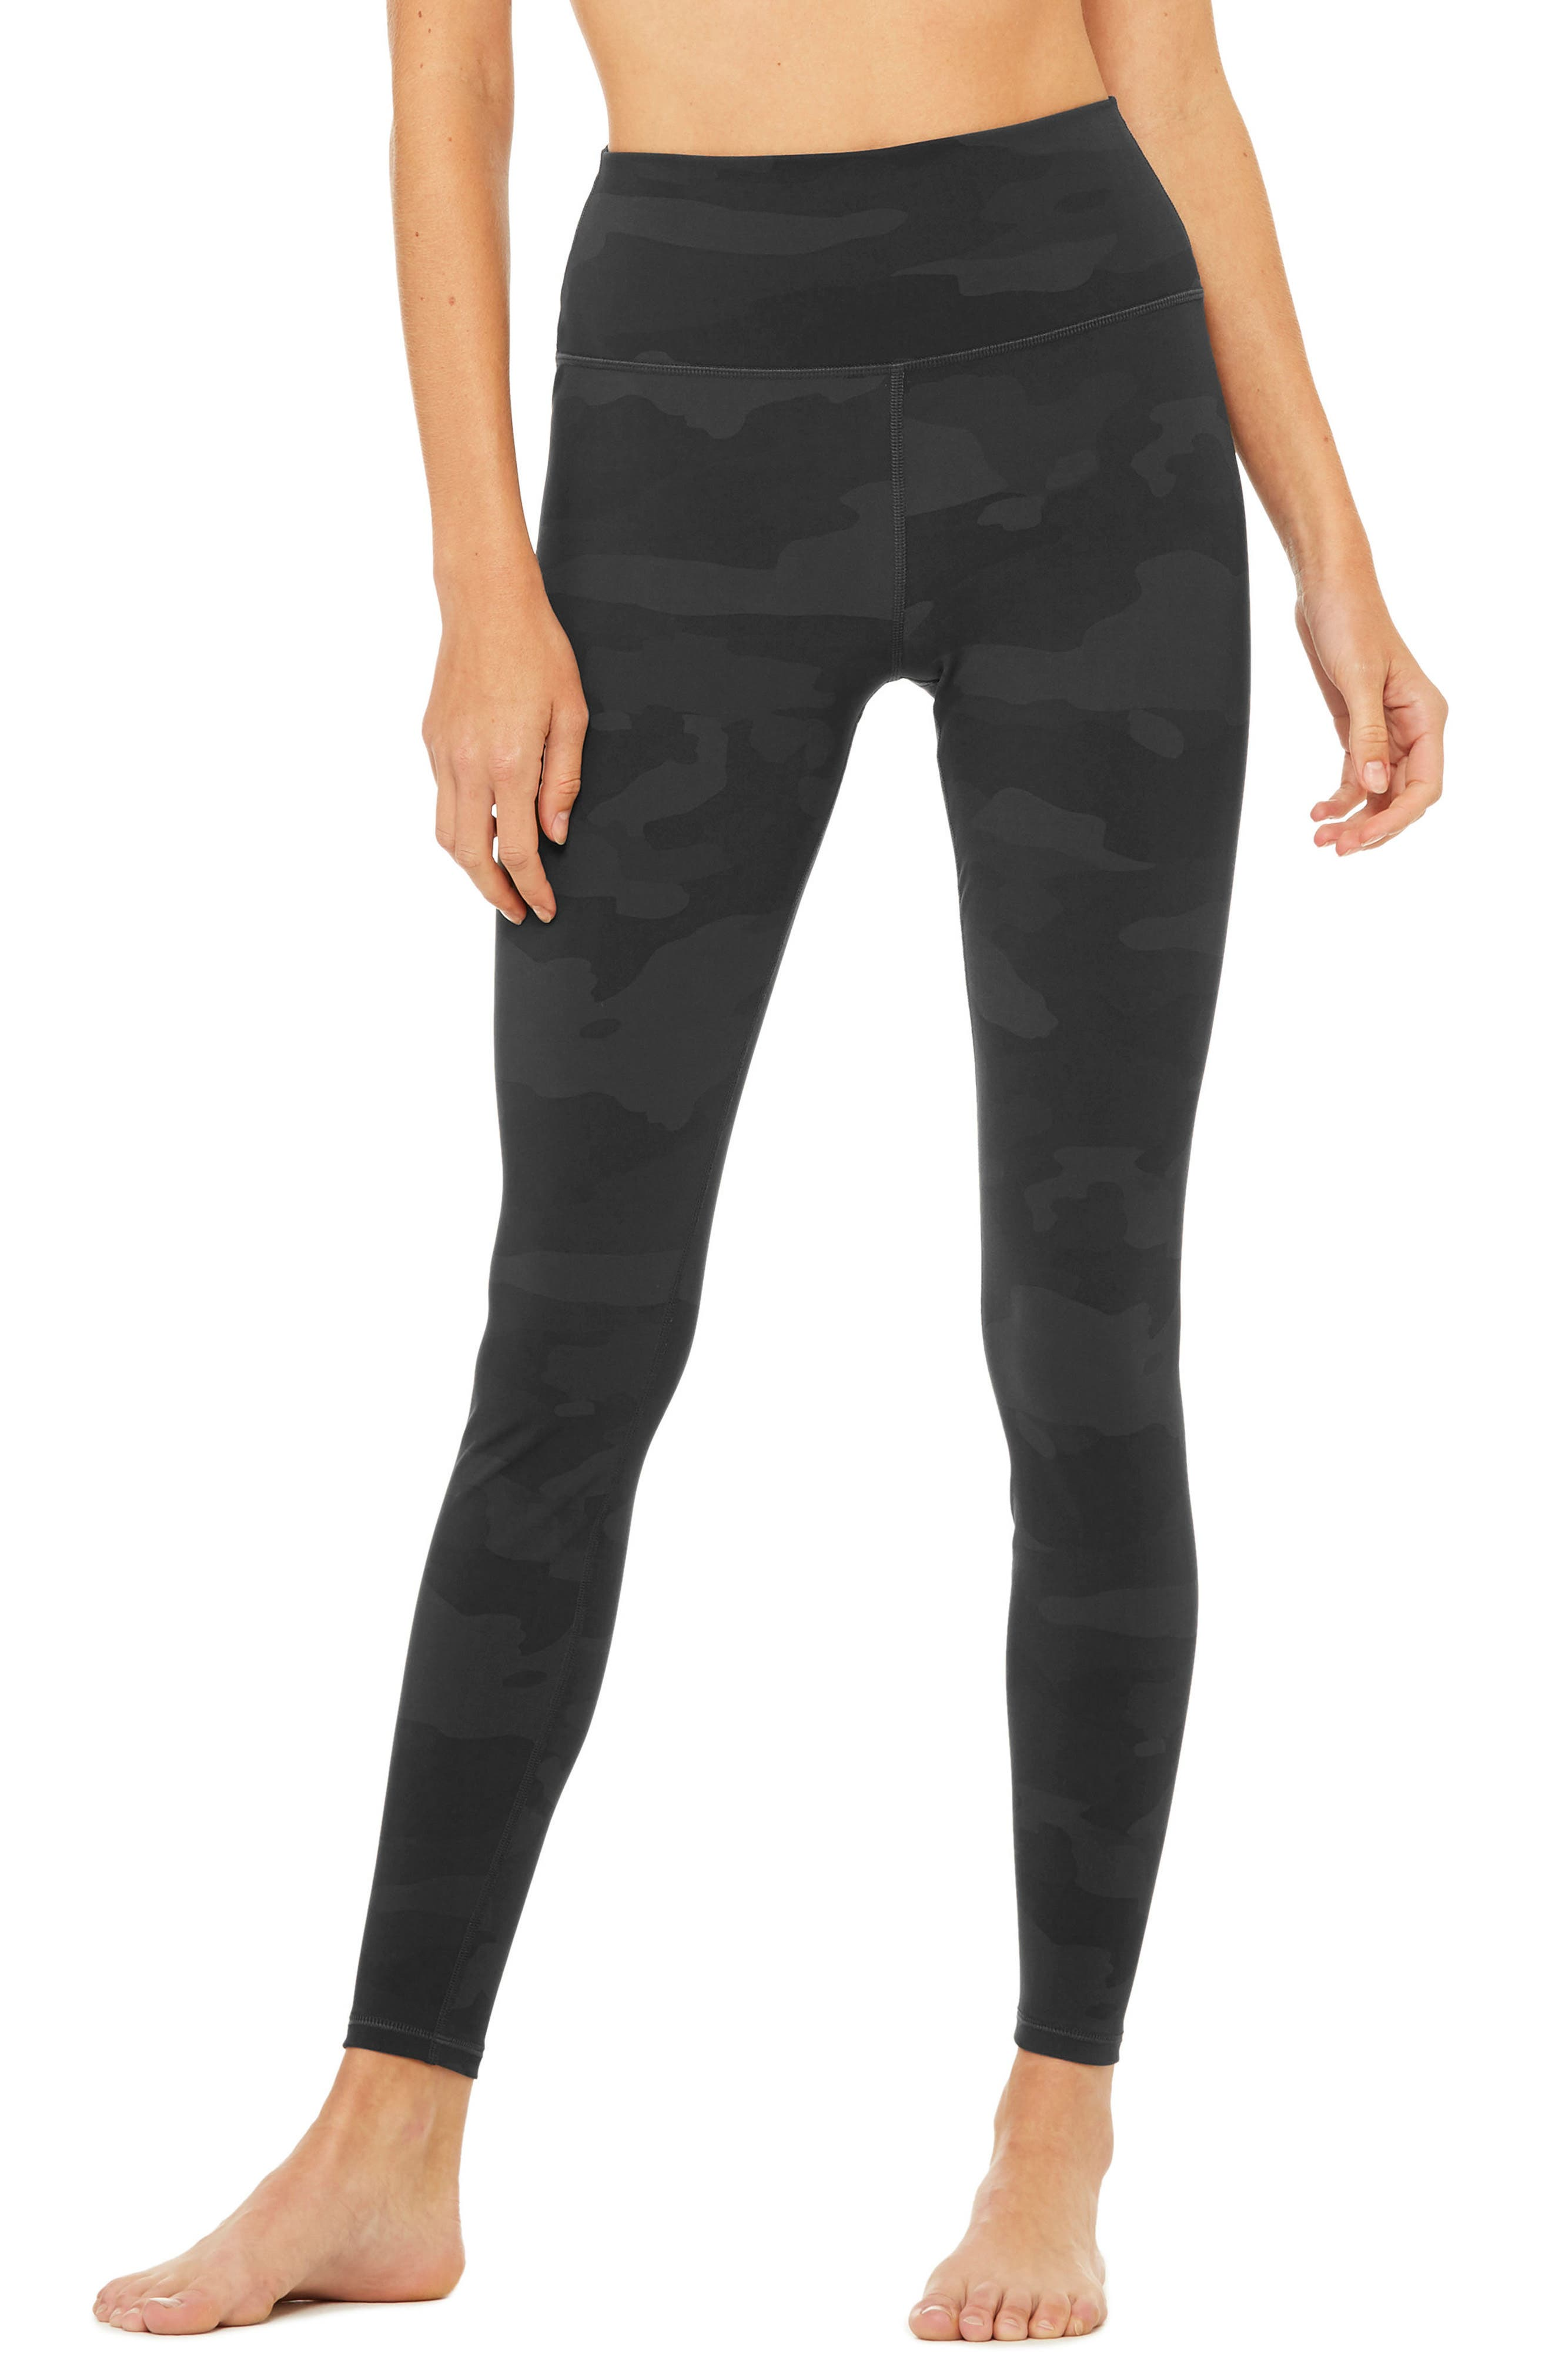 ALO Vapor High Waist Leggings, Main, color, BLACK CAMOUFLAGUE